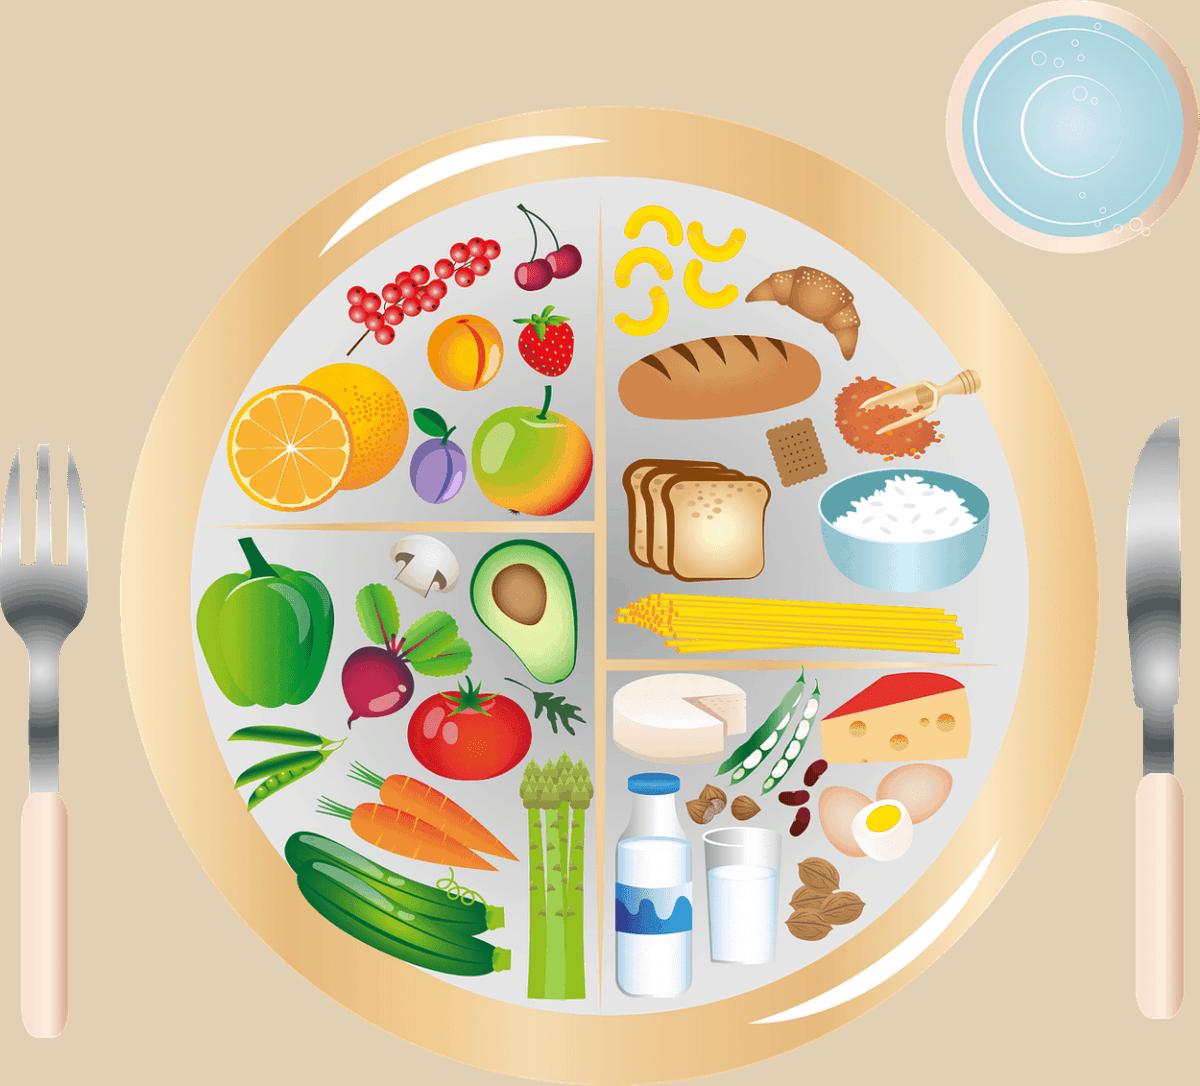 A plate showing a balanced diet chart.